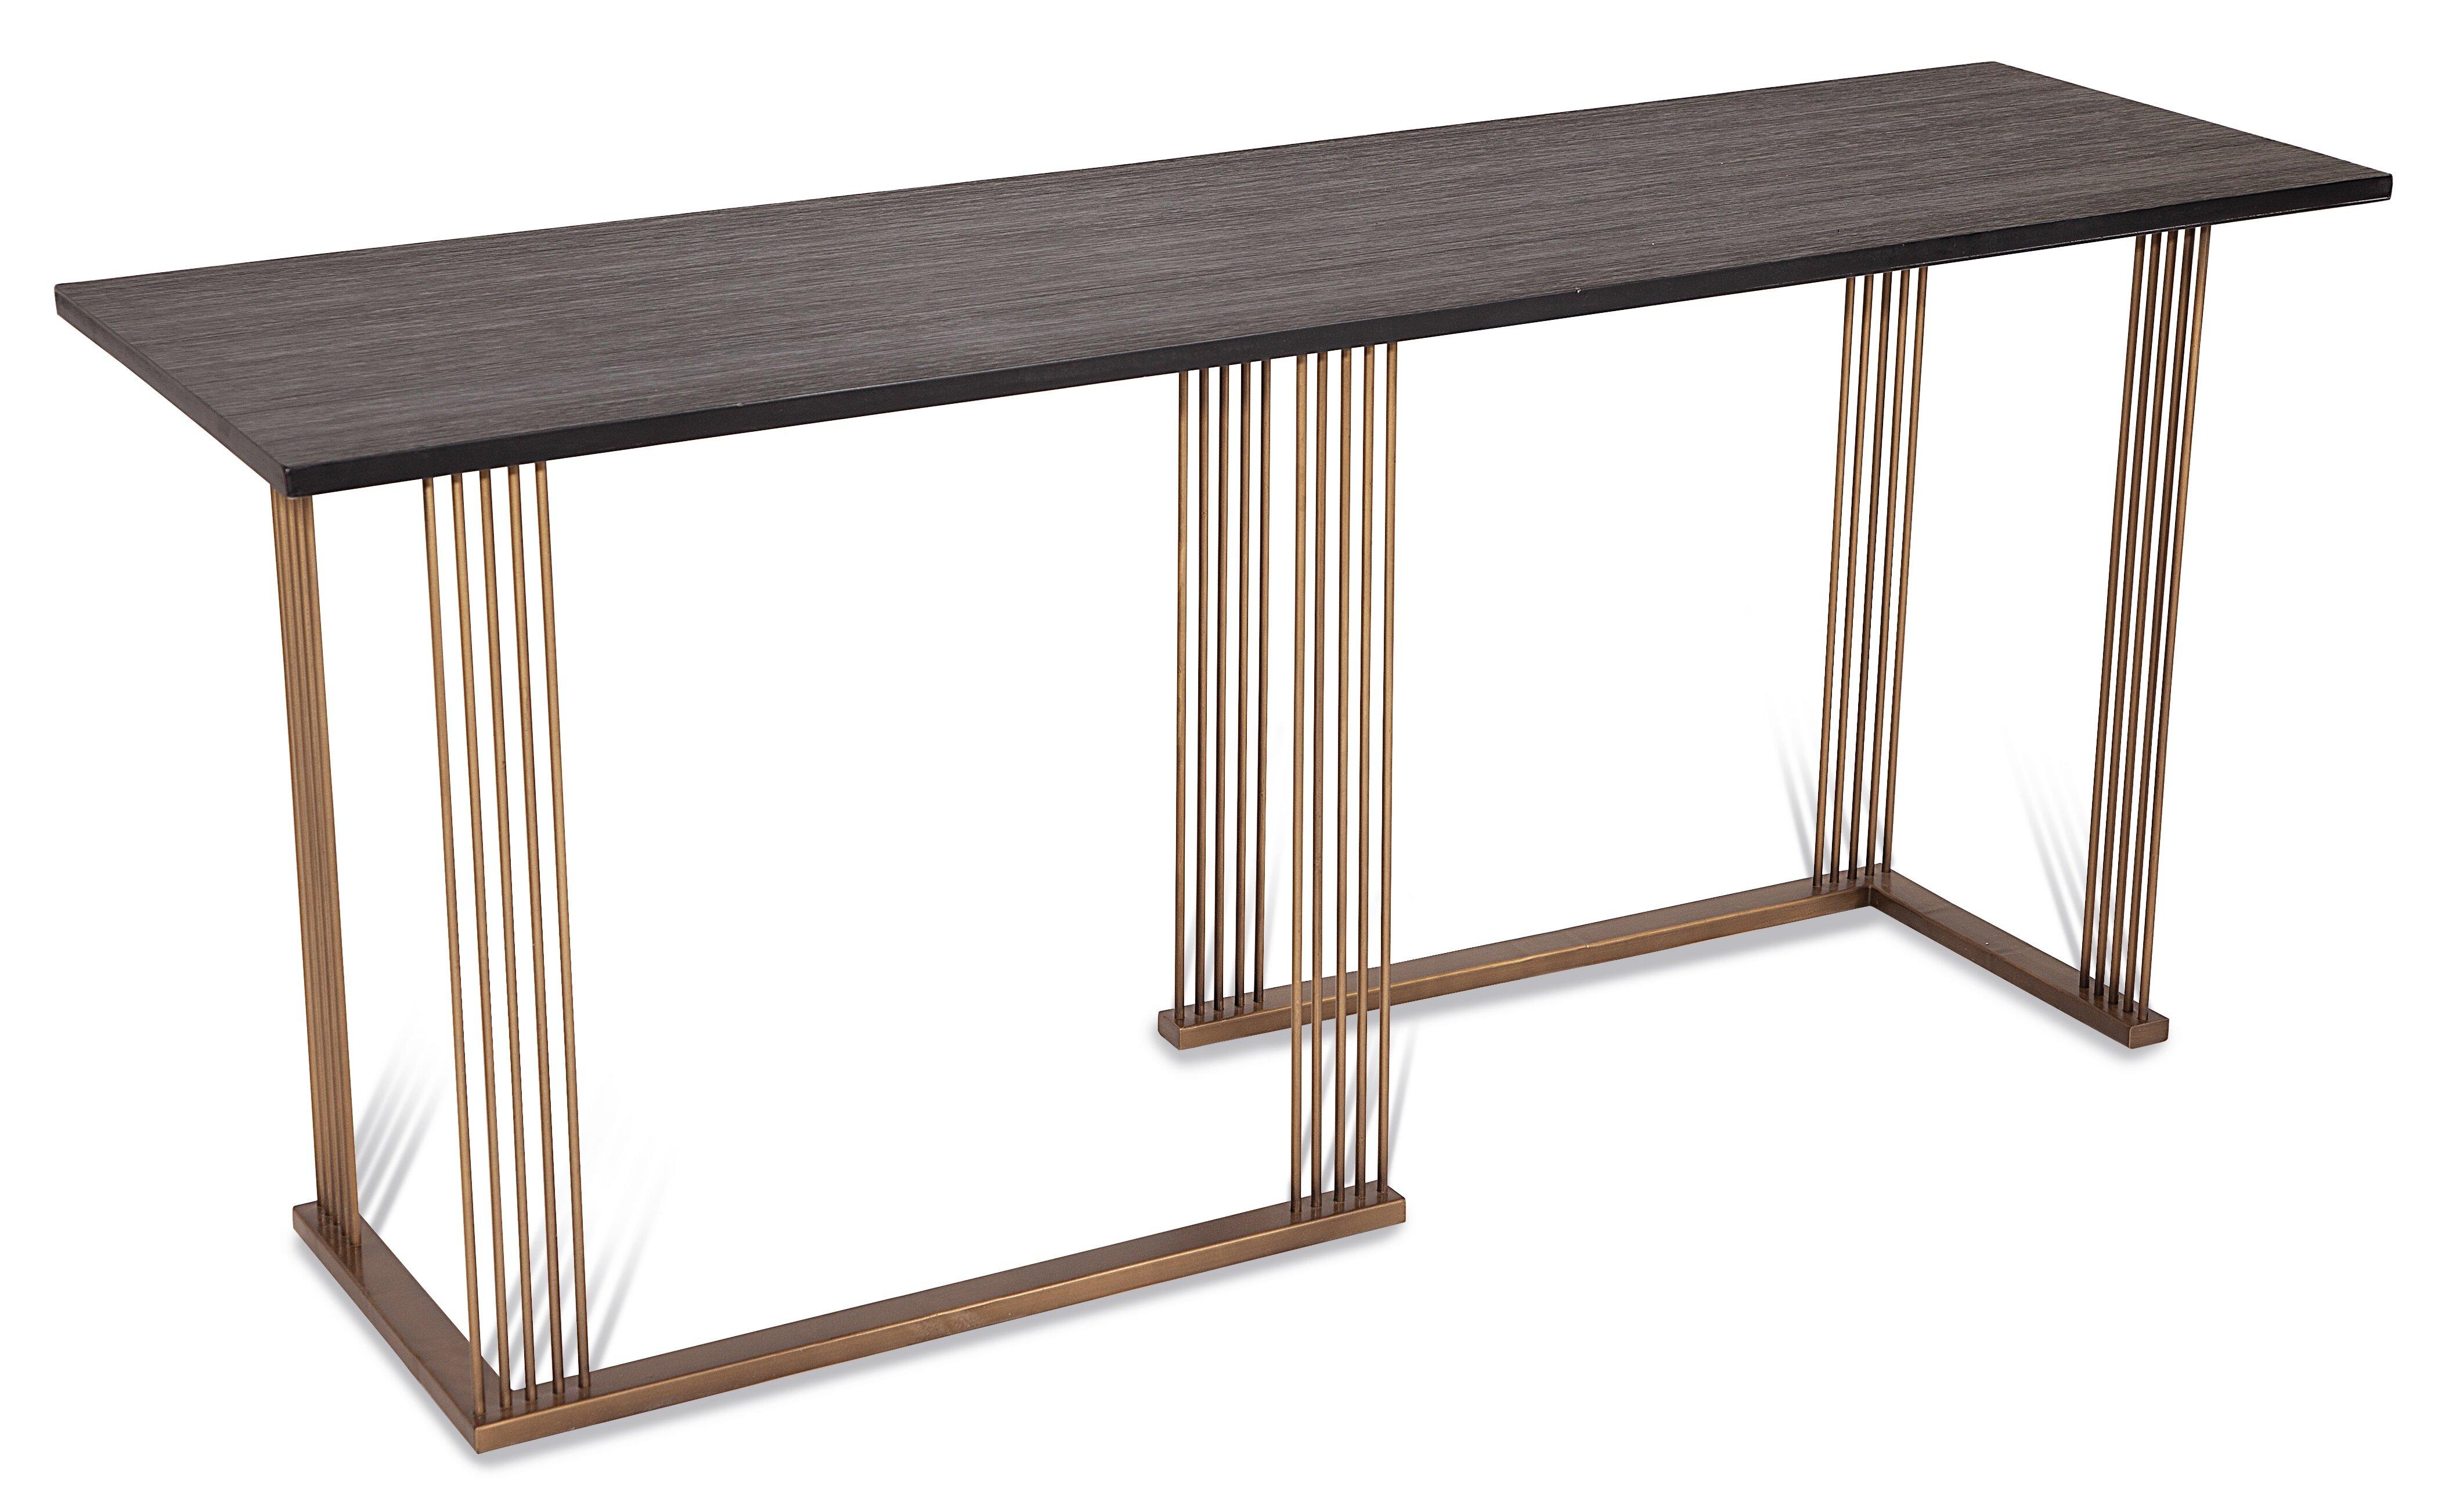 Astounding Kettering 63 Console Table Machost Co Dining Chair Design Ideas Machostcouk